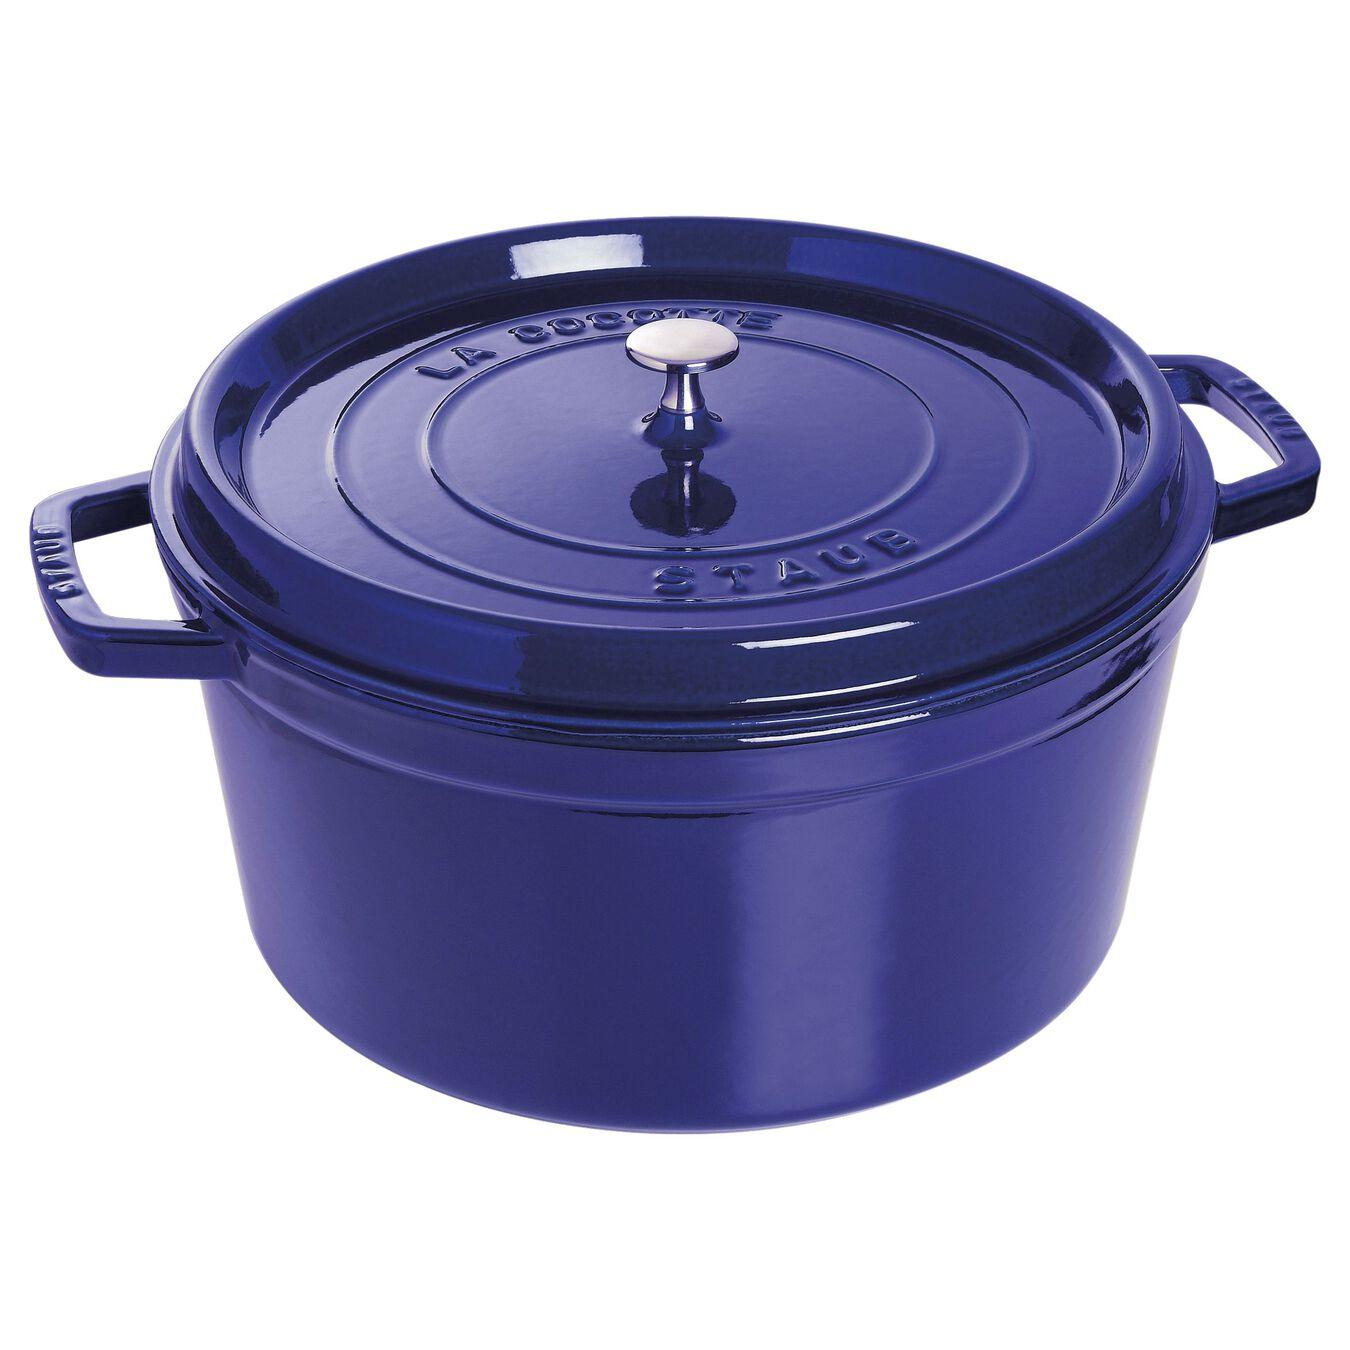 8.4 l round Cocotte, dark-blue,,large 1